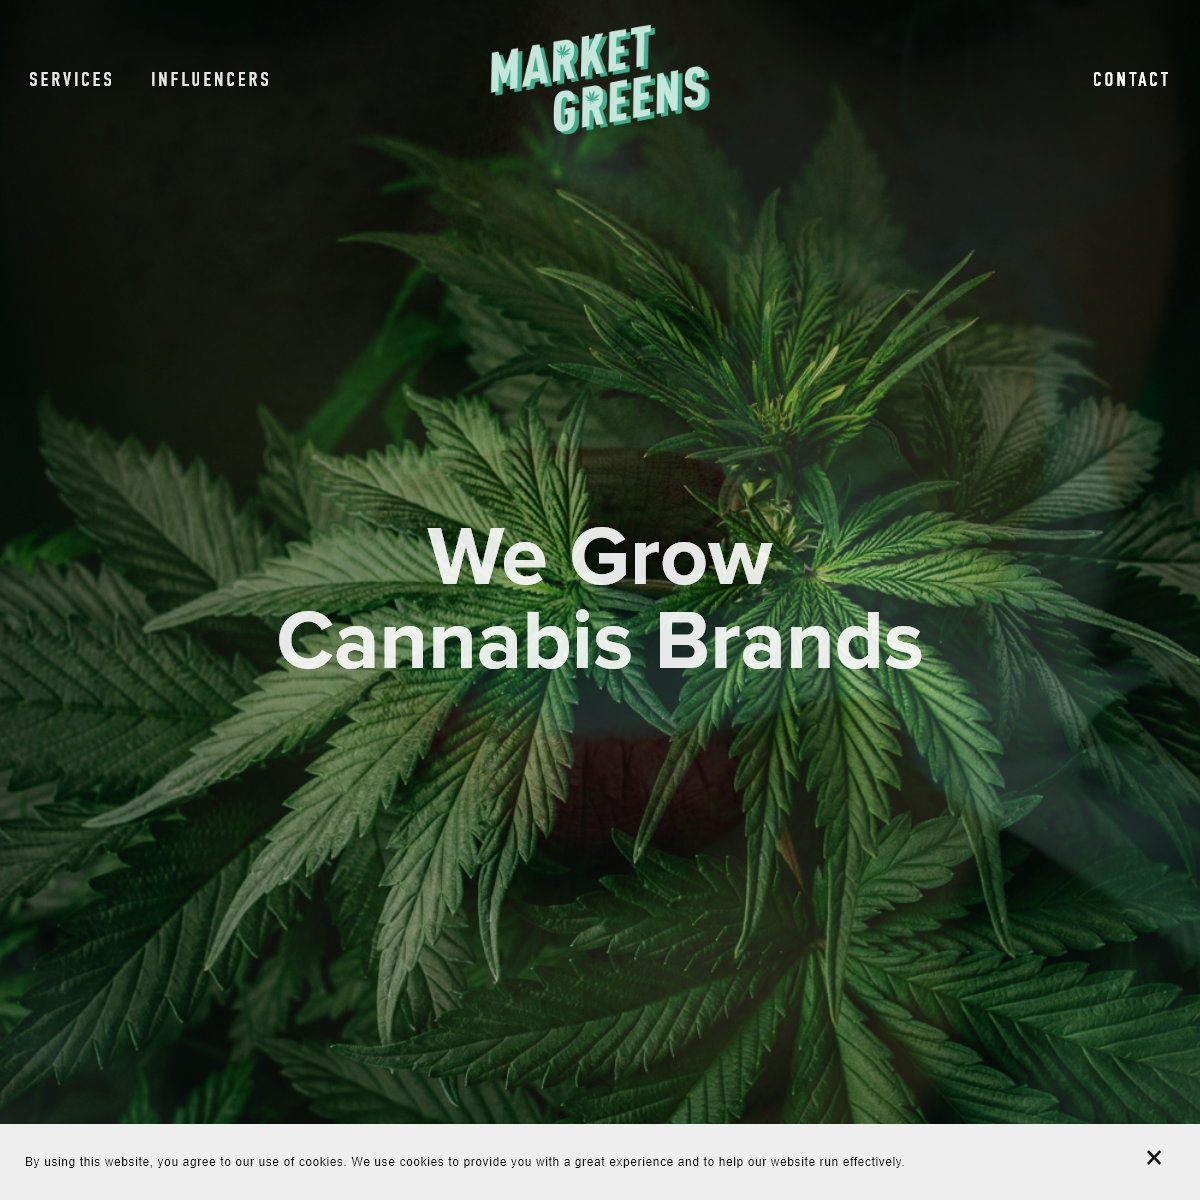 Market Greens - Cannabis Marketing Agency